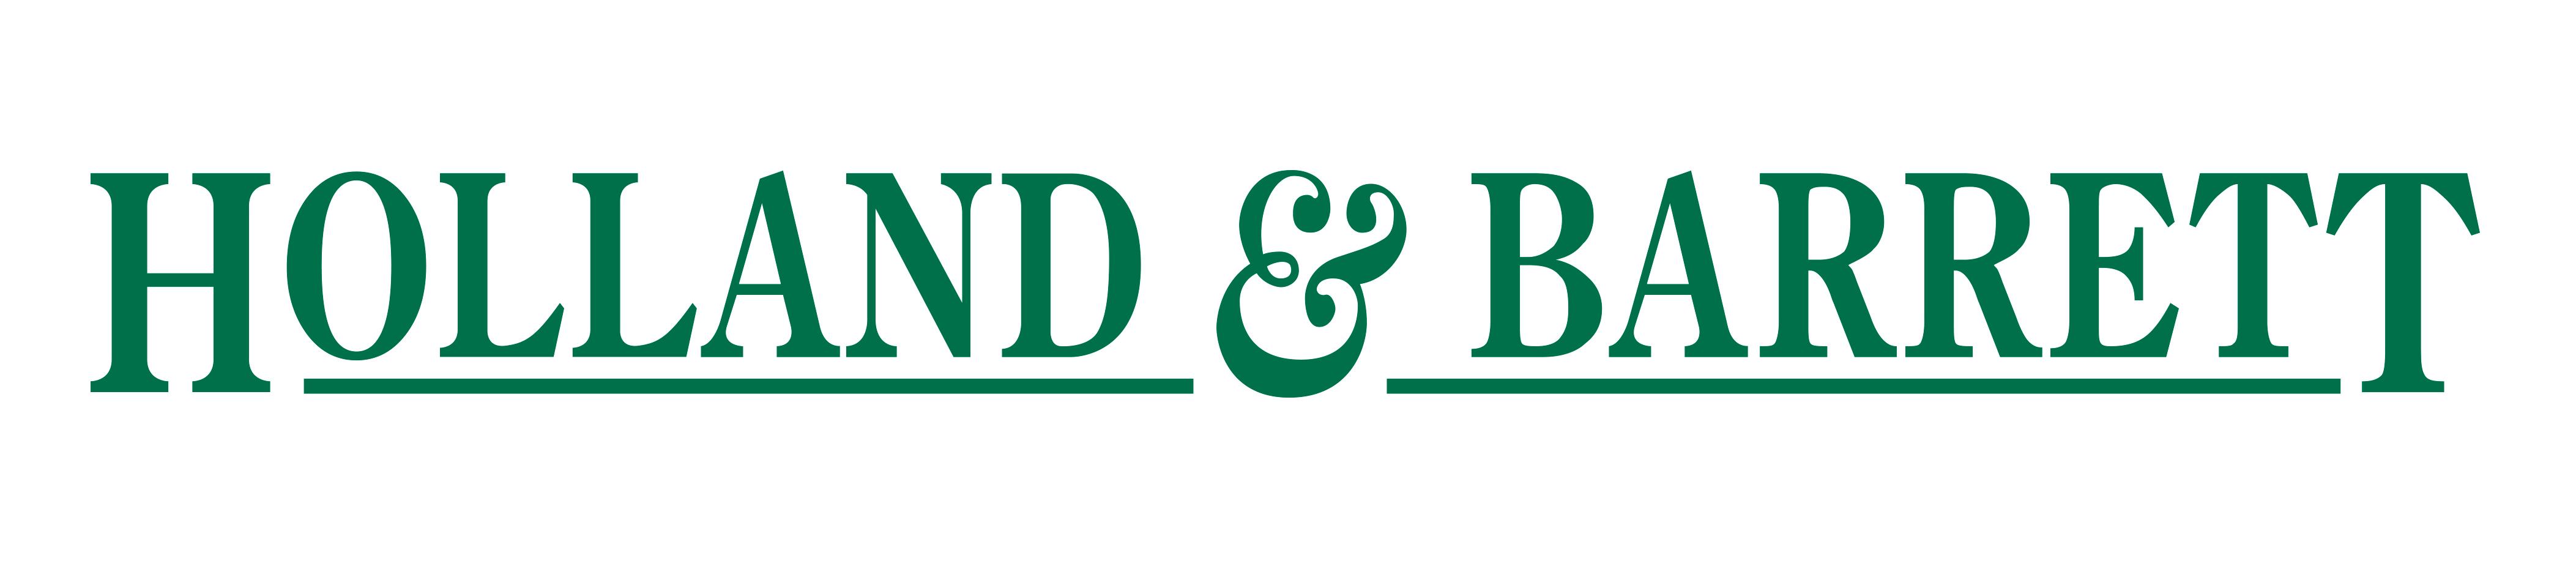 holland-and-barrett-logo.png